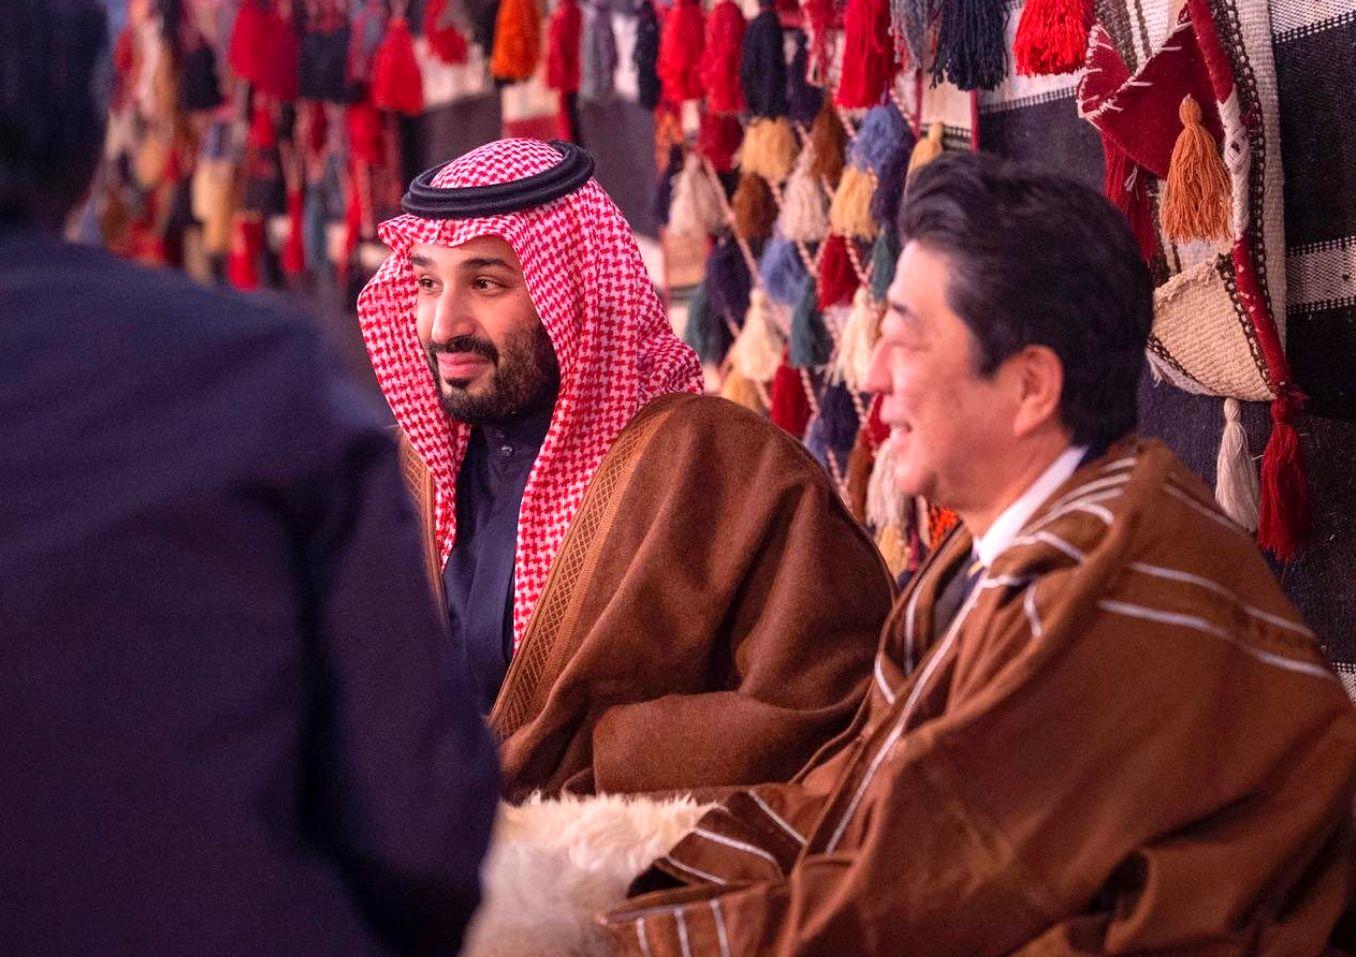 آبی بالعباءة صحبة بن سلمان فی خیمة سعودیة (صور+ فیدیو)